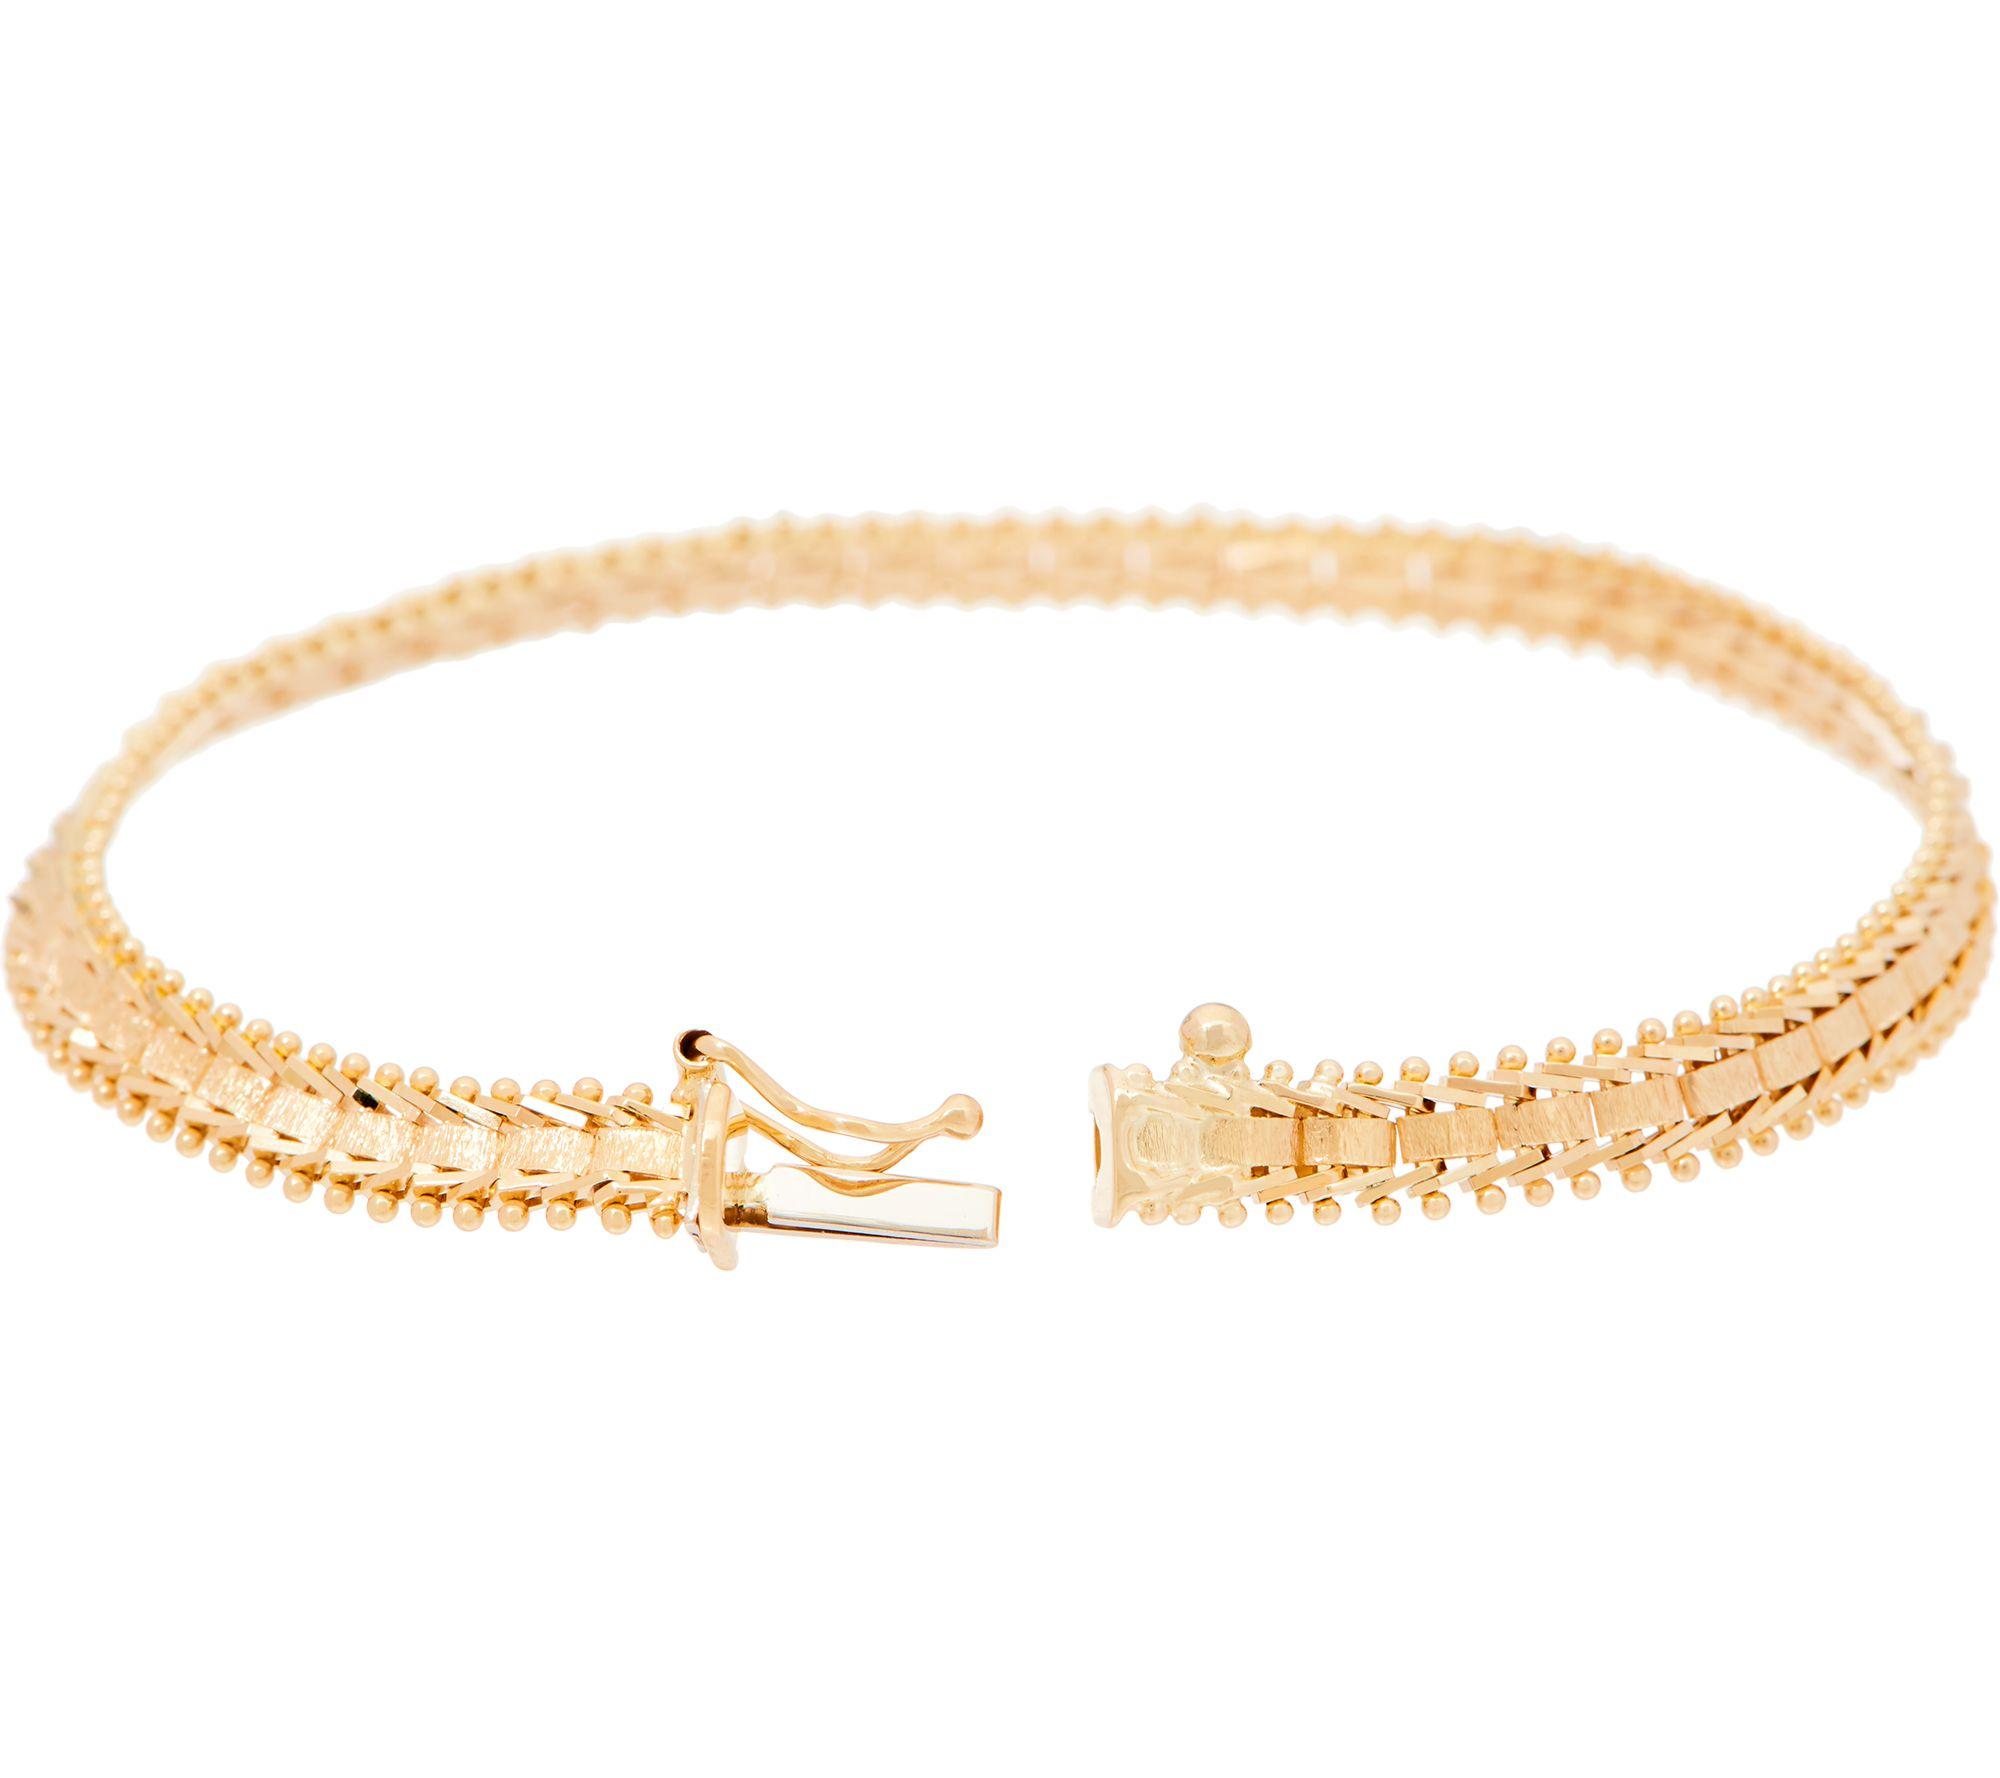 Imperial Gold 7 1 4 Satin Sheen Bracelet 14k 8 0g Page Qvc